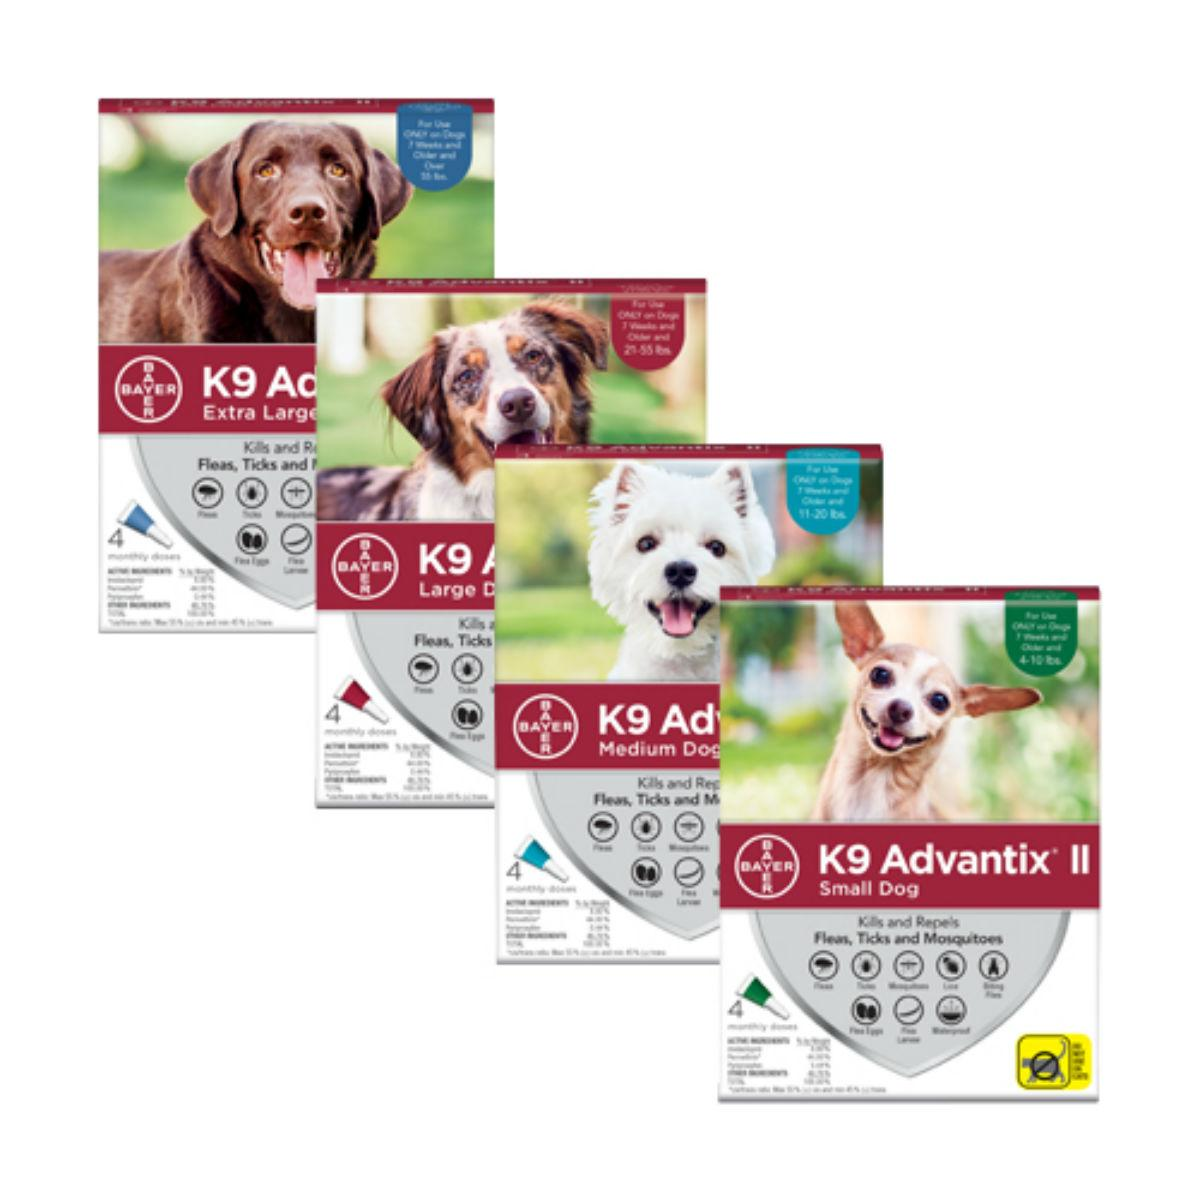 K9 Advantix II Flea and Tick Topical Dog Treatment - 4 Month Supply